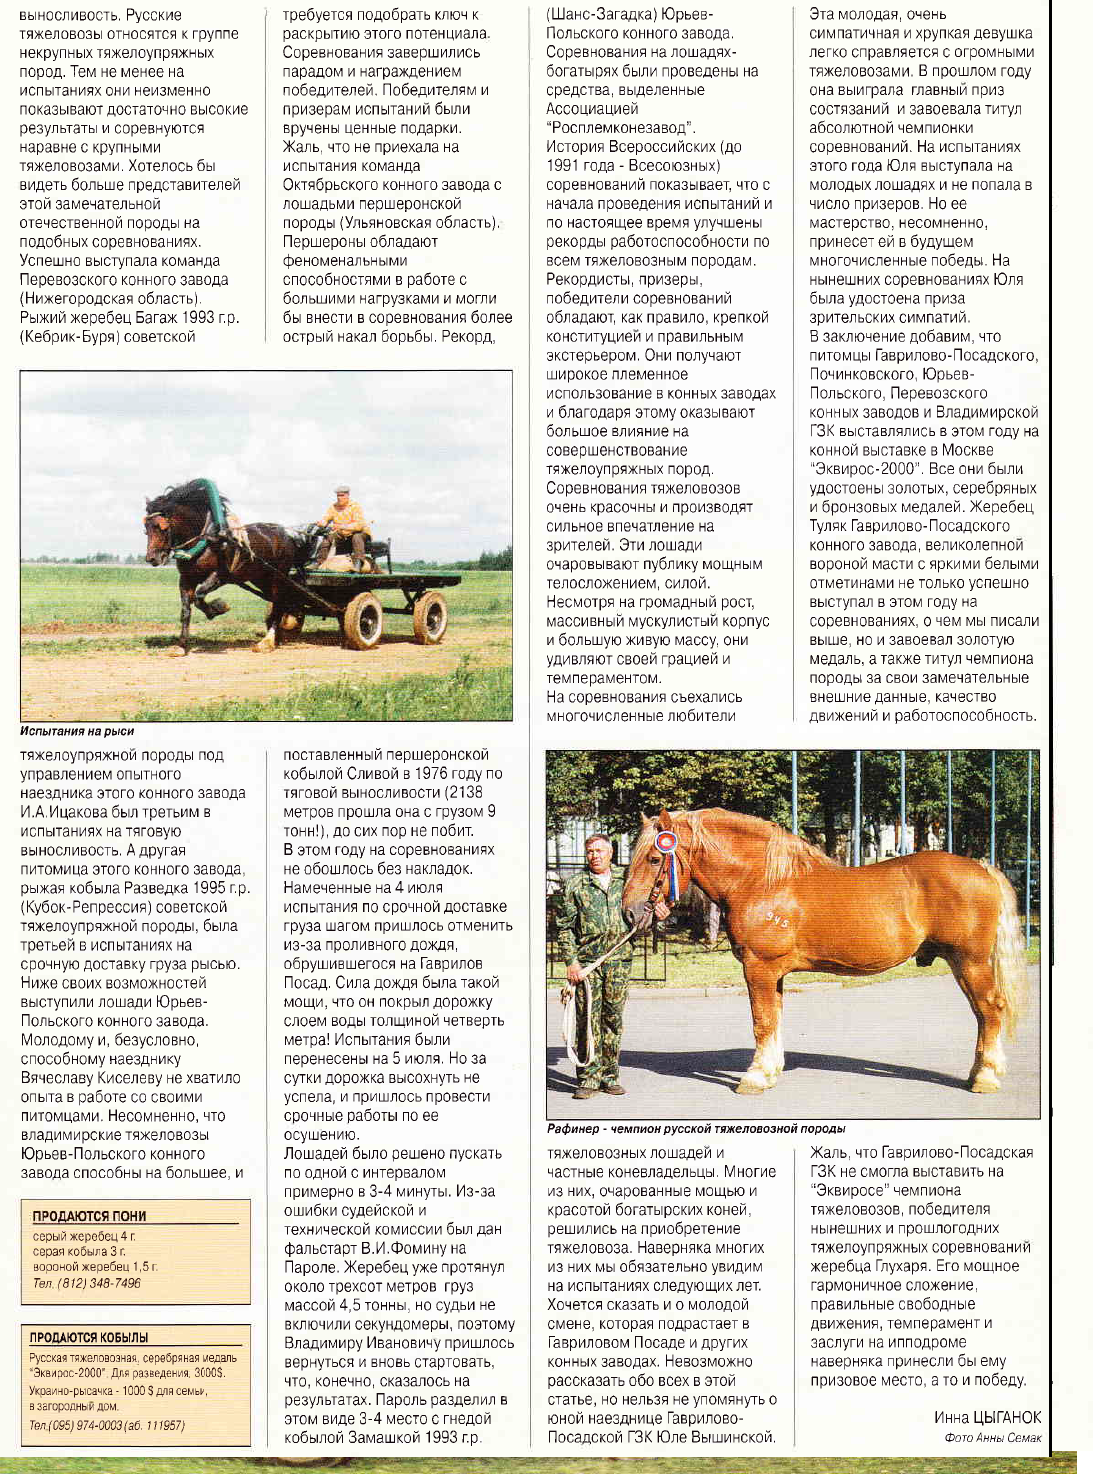 Богатырские кони. Статья из журнала КМ 1-2001 F18e13fbddec6b2315b752fcdacdb86a